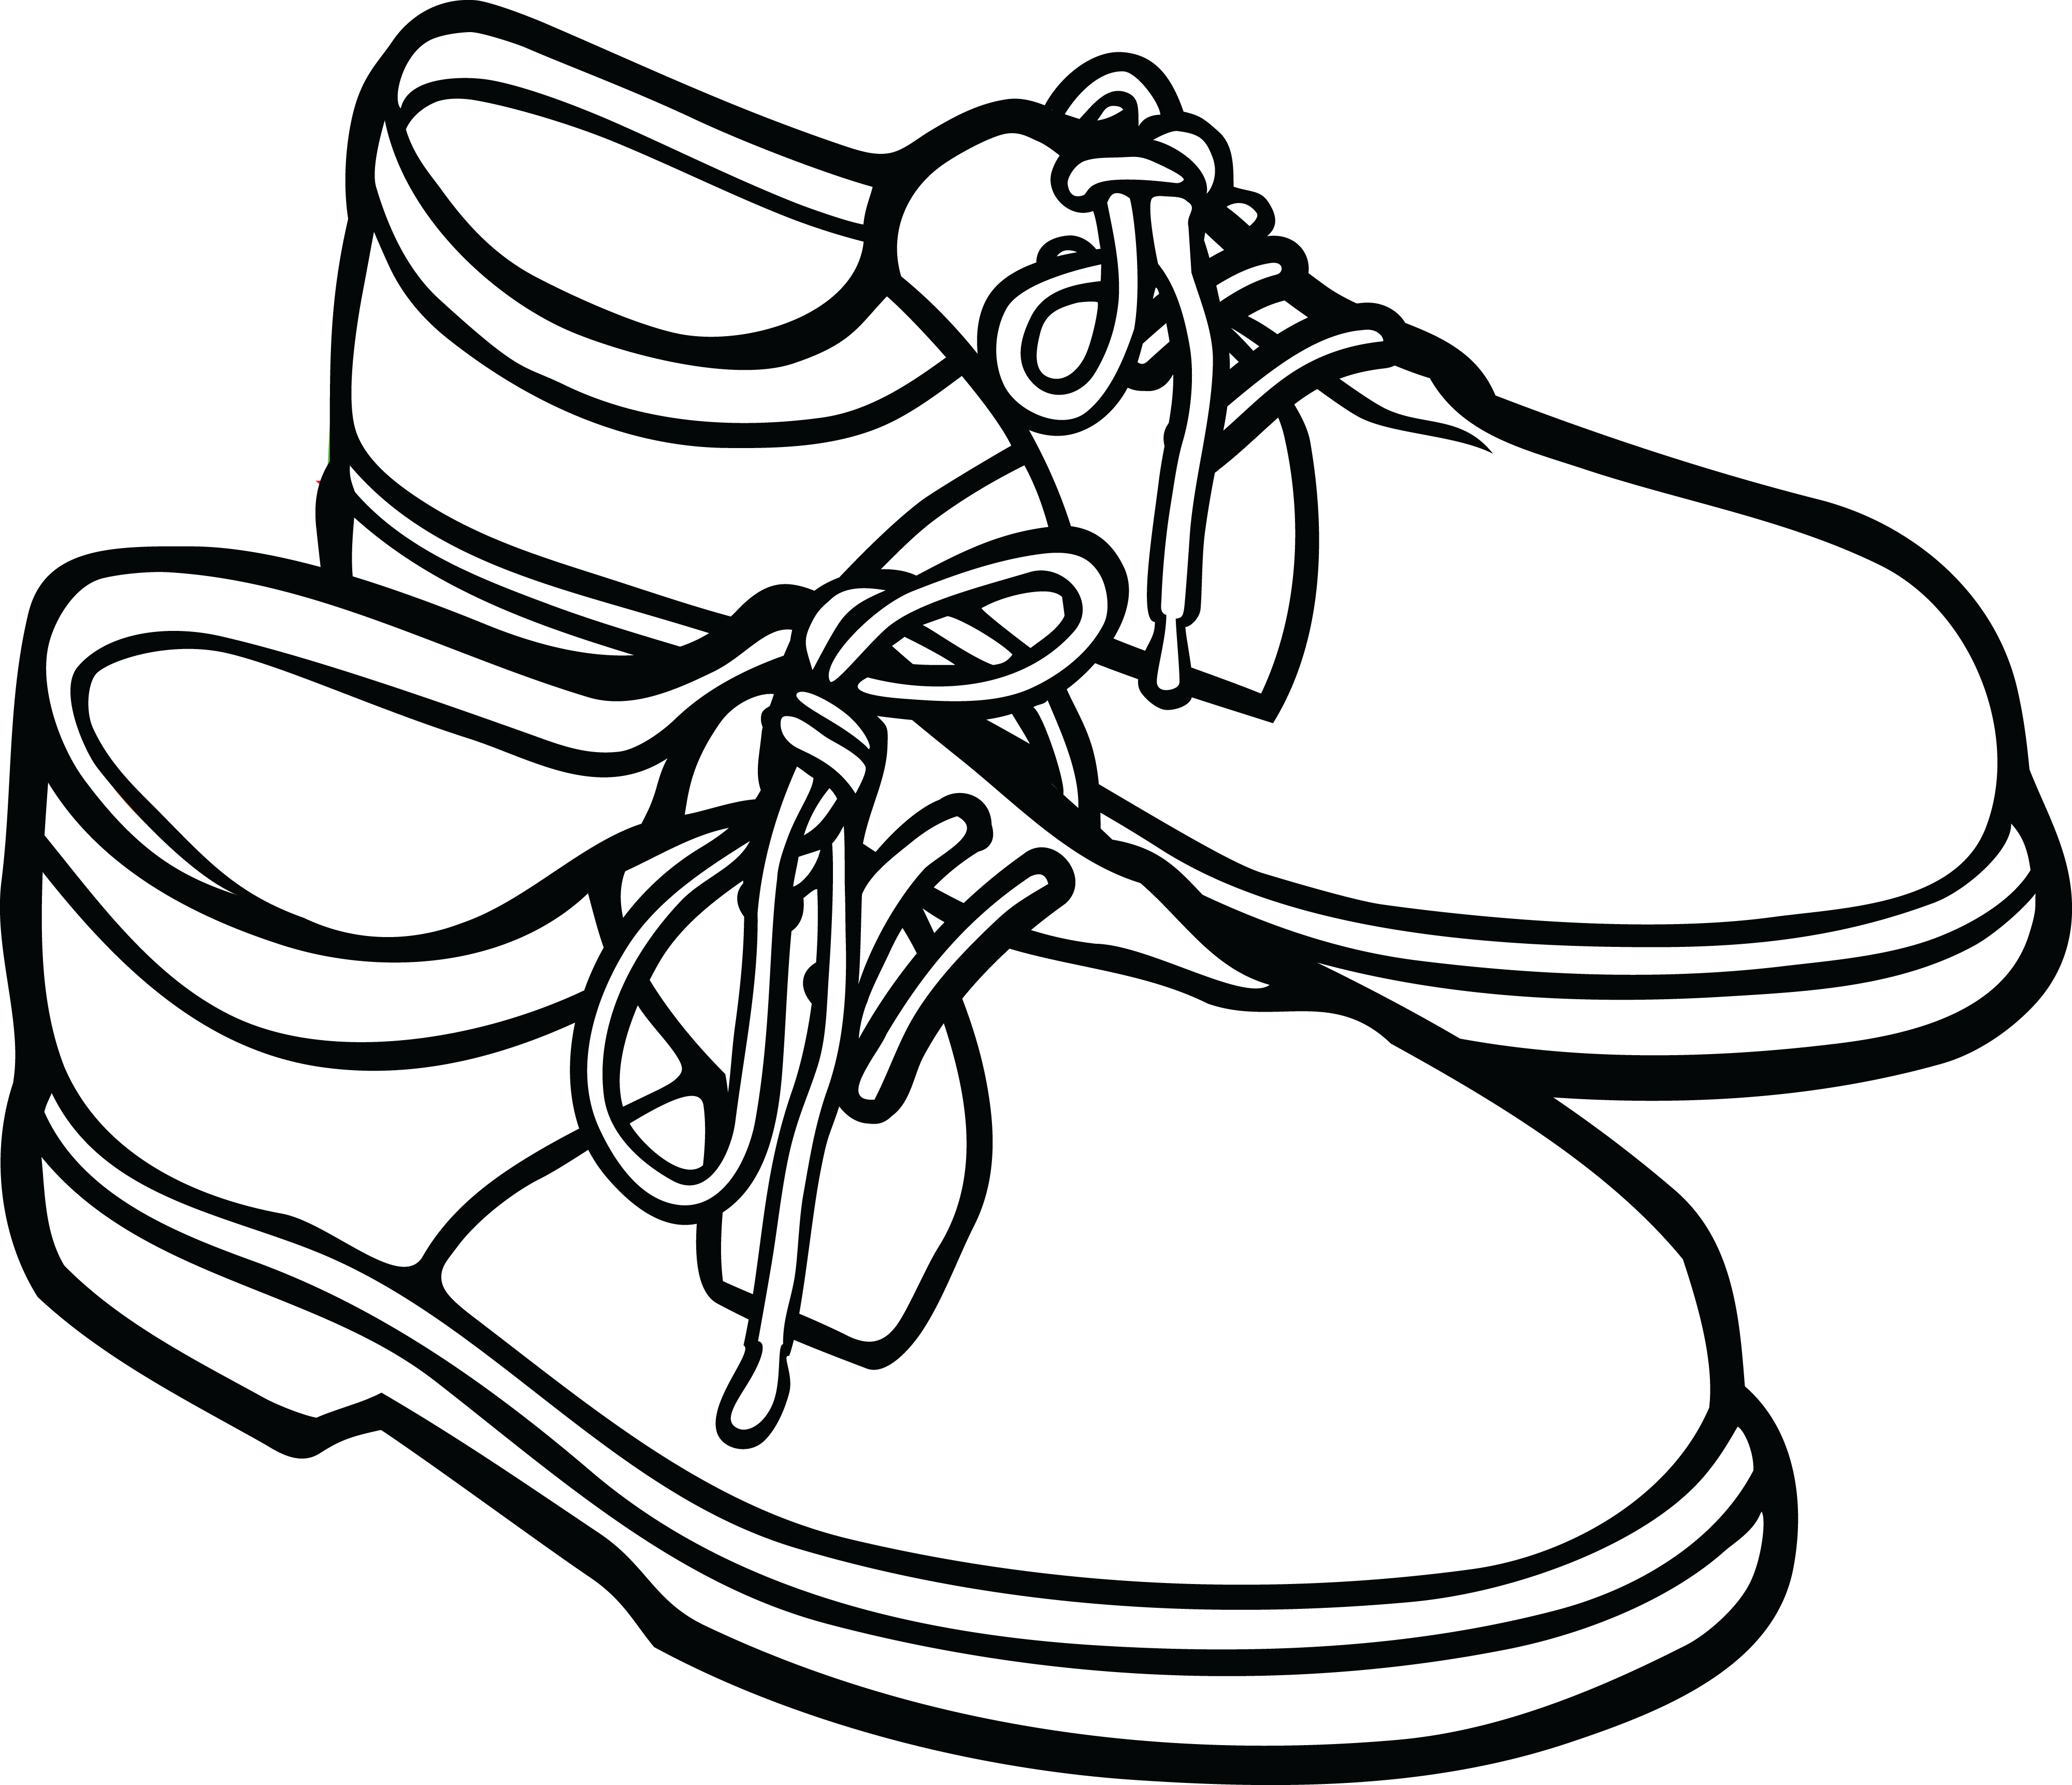 Coat shoe free camera. Clipart socks sort